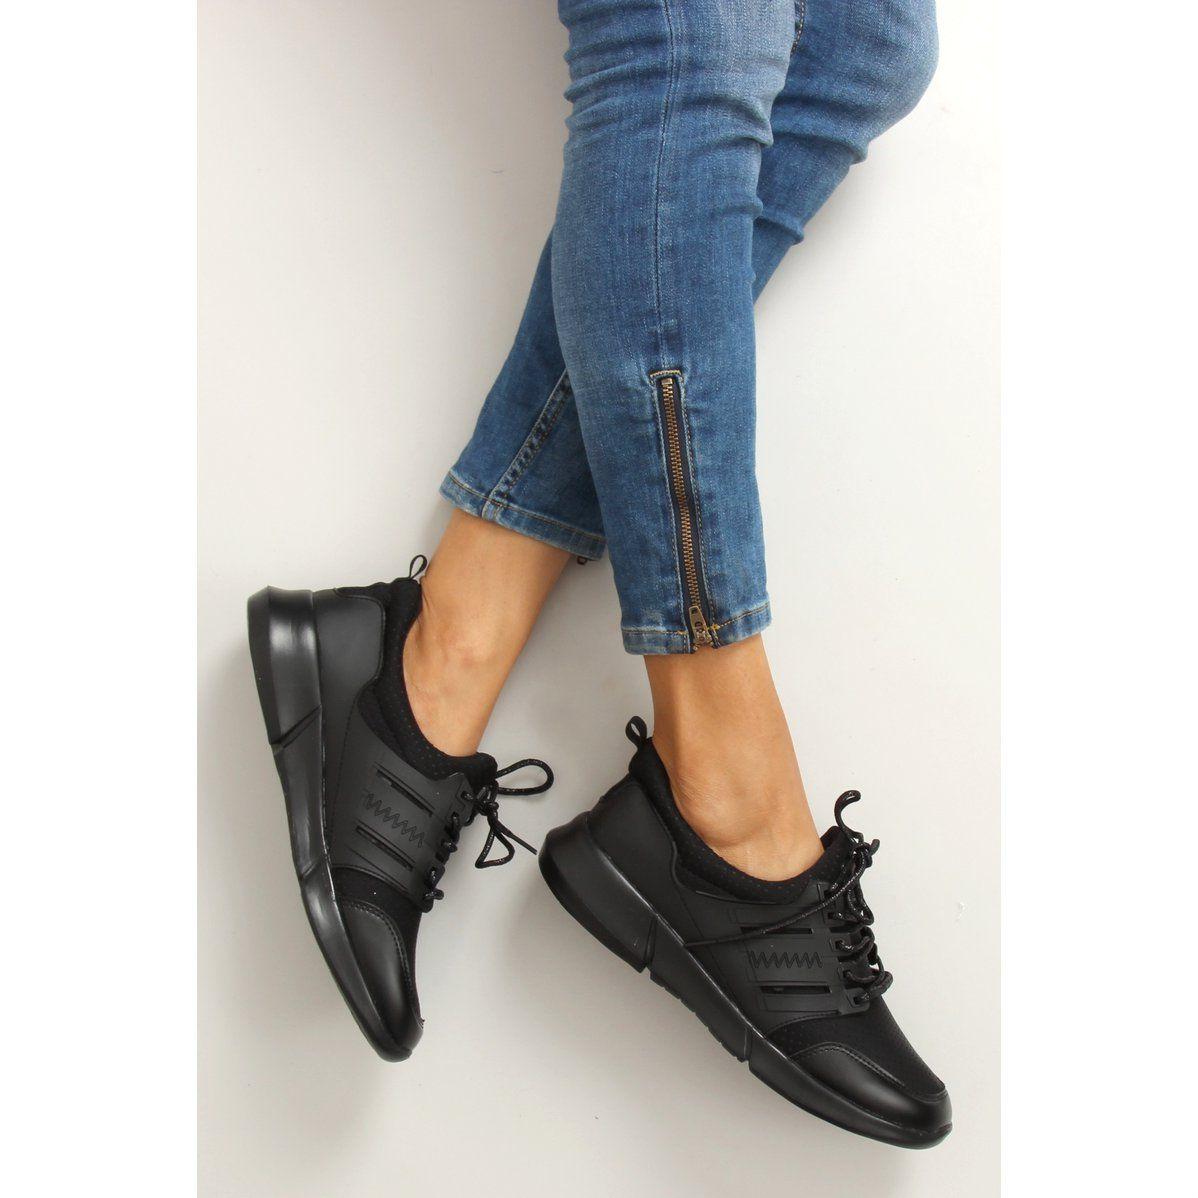 Lekkie Buty Sportowe B3120b Sp Black Czarne Bow Sneakers Shoes Black Sneaker